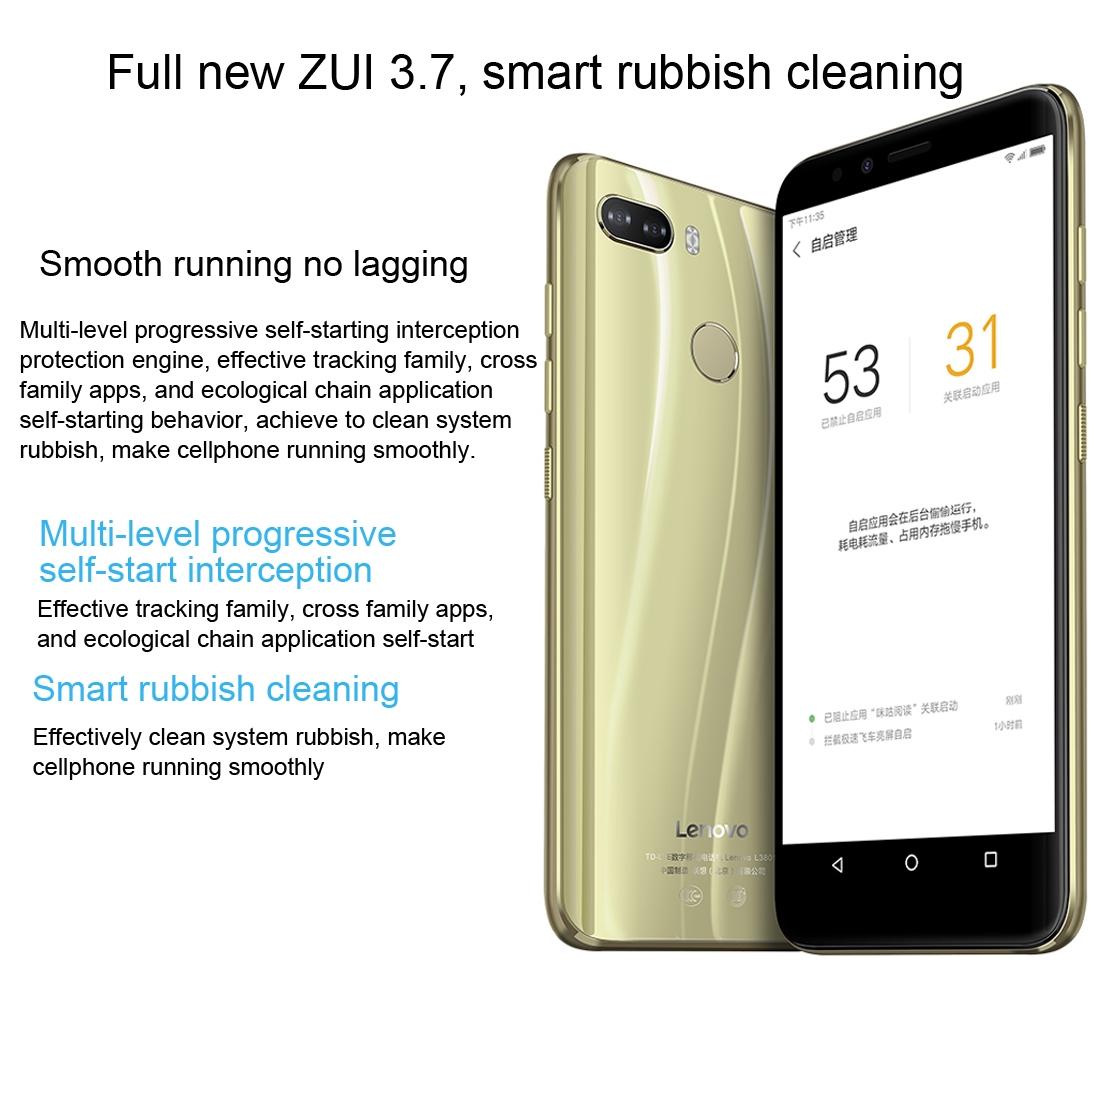 i.ibb.co/DkNxWKy/Smartphone-3-GB-32-GB-Jogo-Lenovo-K5-Play-Azul-10.jpg